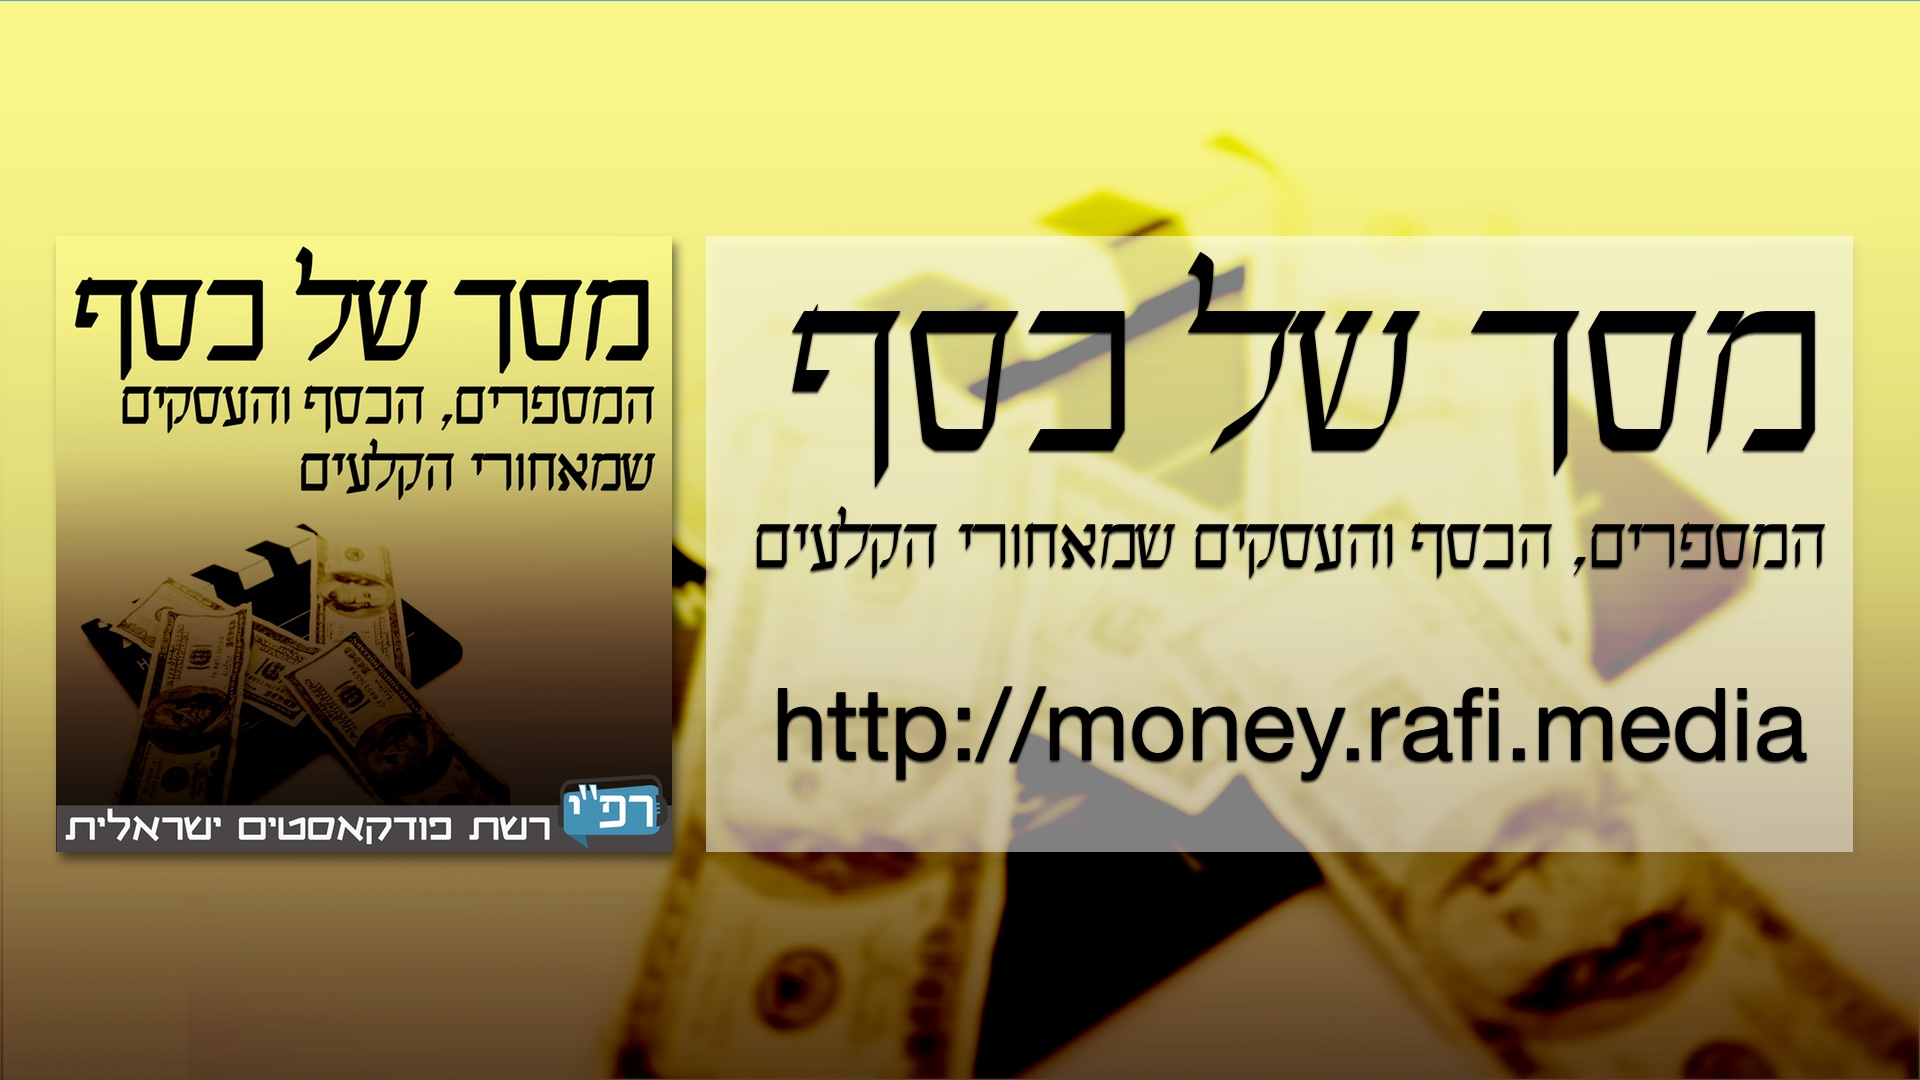 moneyscreen_1920_new.jpg